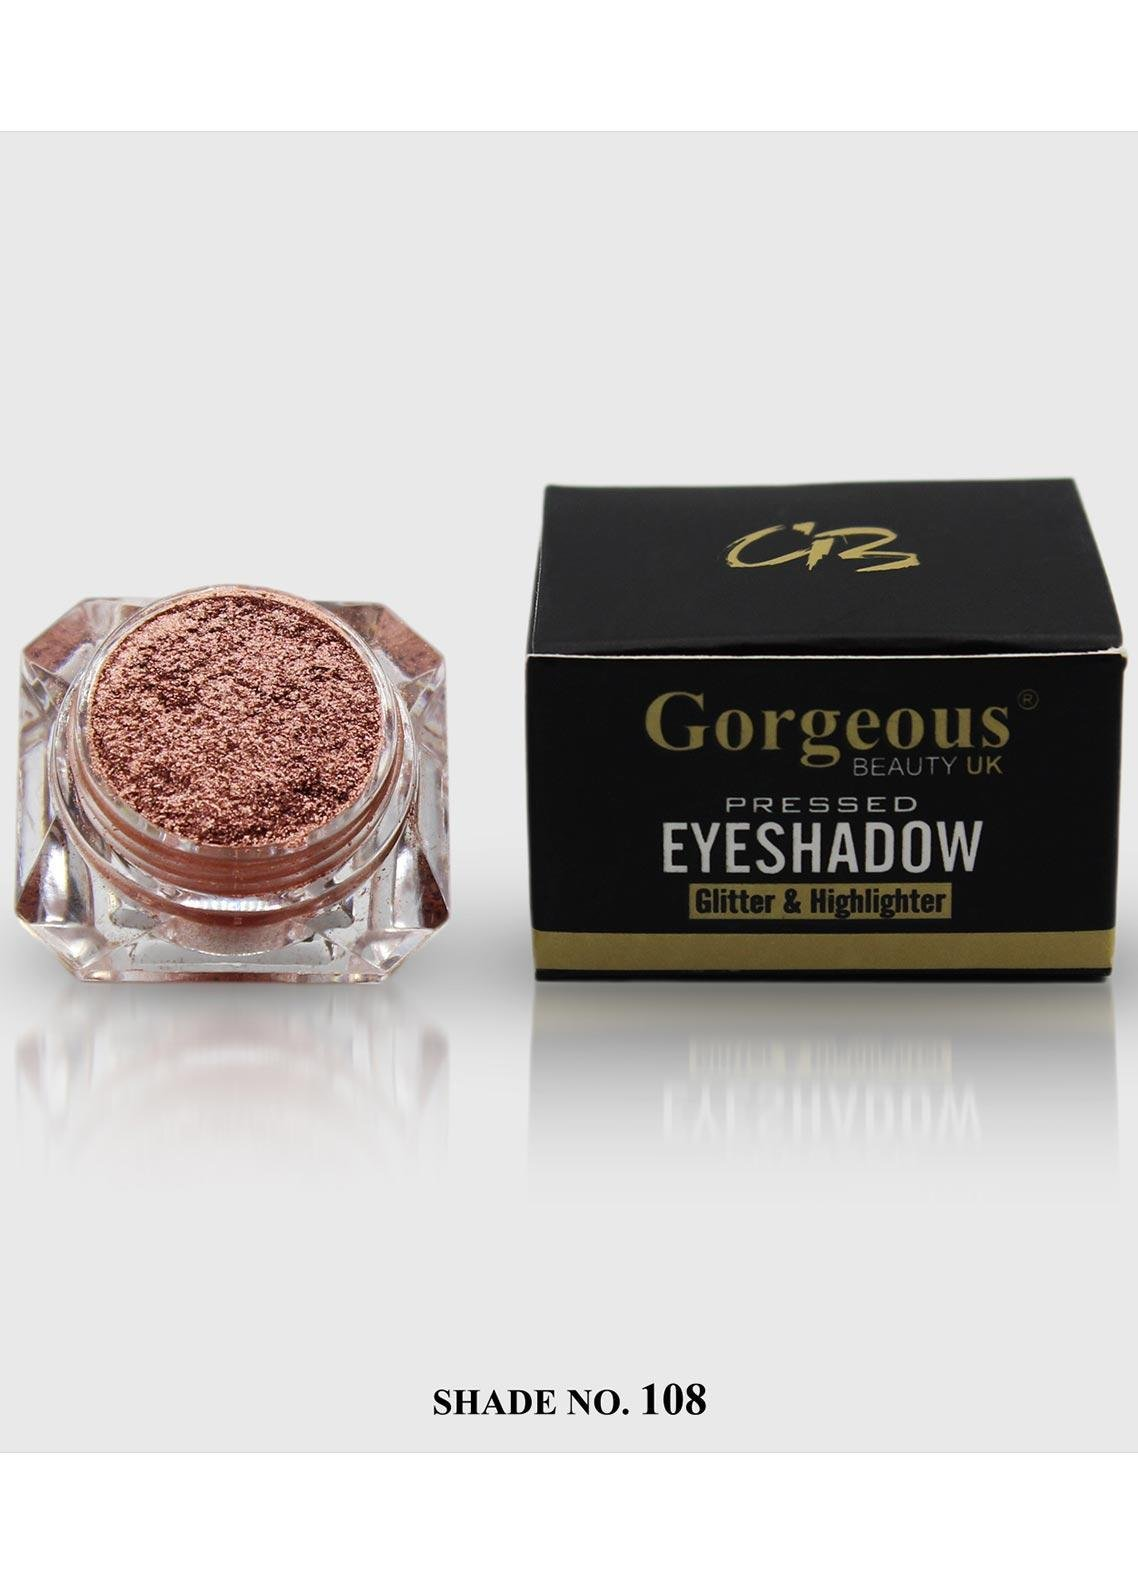 Pressed Eye Shadow Glitter & Highlighter-108